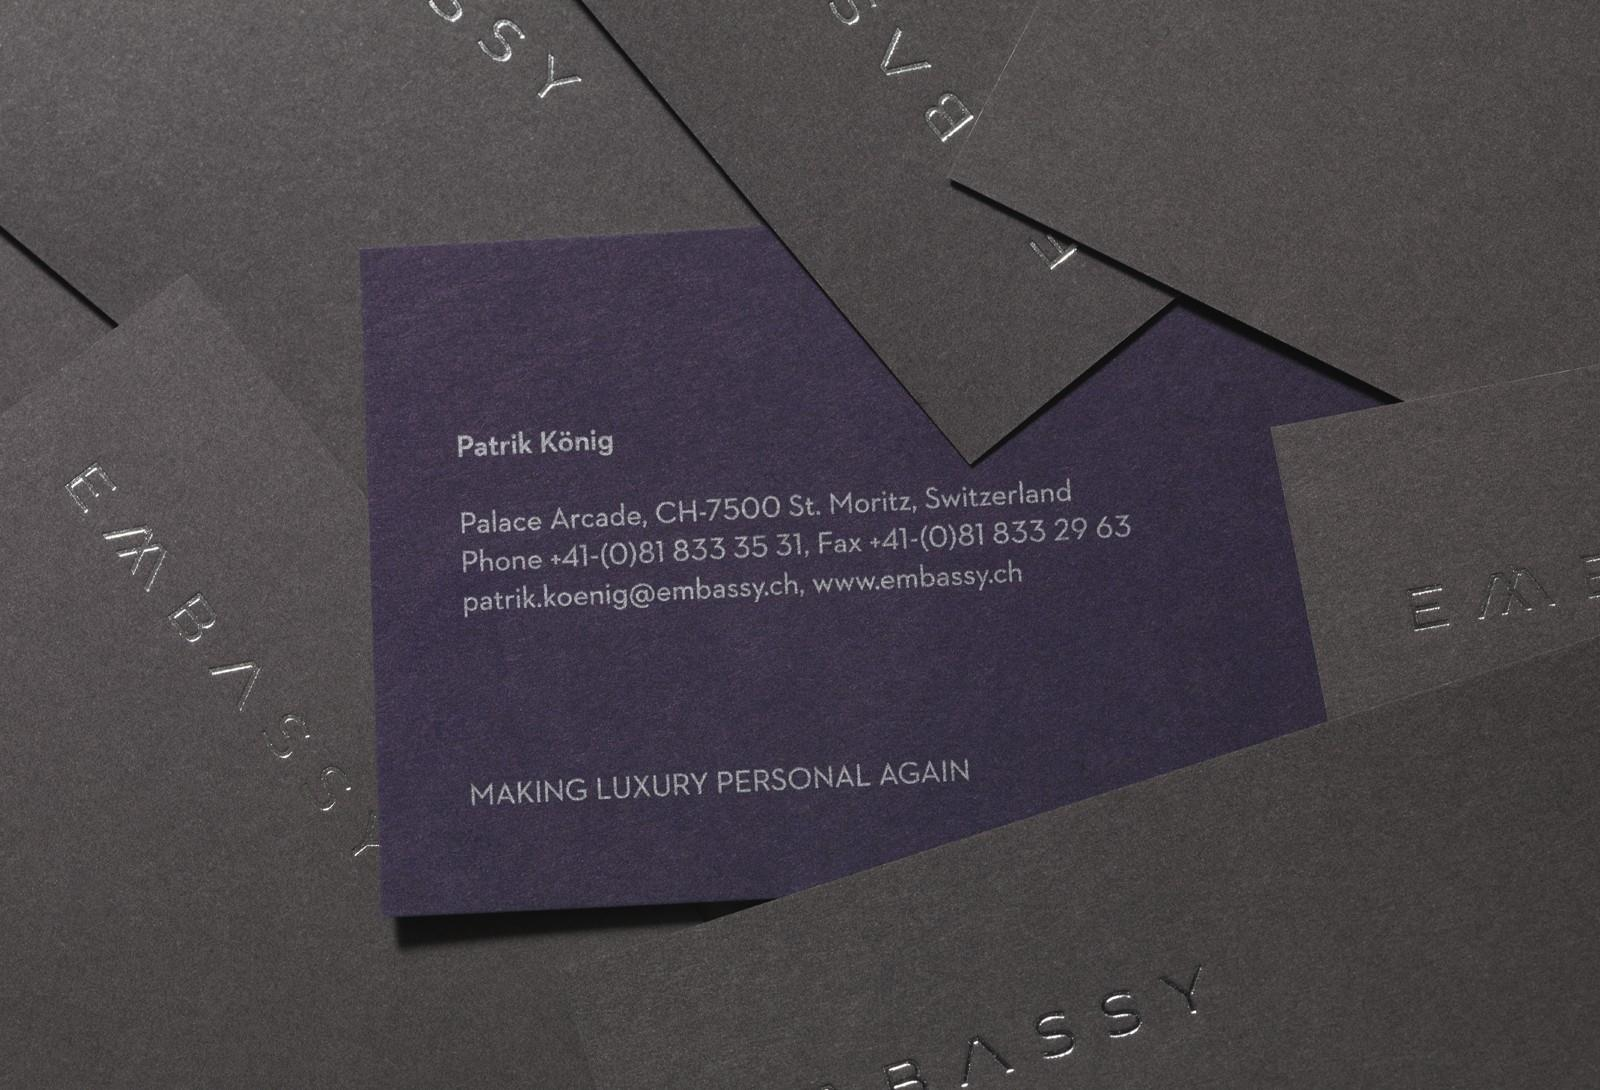 Embassy奢侈品零售品牌品牌形象设计,Embassy是瑞士康尼锡家族的零售品牌。提供高端手表、珠宝、艺术品和古董,夫妇用传统价值观和新思维来创建最终的奢侈品客户体验。Embassy将自己定位成一个公司,为其客户把梦想变成现实。品牌需要重新塑造形象, 解决方案需要简单、低调但同时灌输一种真正的卓越。  解决方案灵感来自于邻近的雪山上流下来的紫花苜蓿原始的Embassy创建新品牌呼应了形状,颜色和轮廓的城市和风景。 开发了一个新的摄影风格,不仅强调产品的丰富性和质量打折也是公司背后的人和地方。